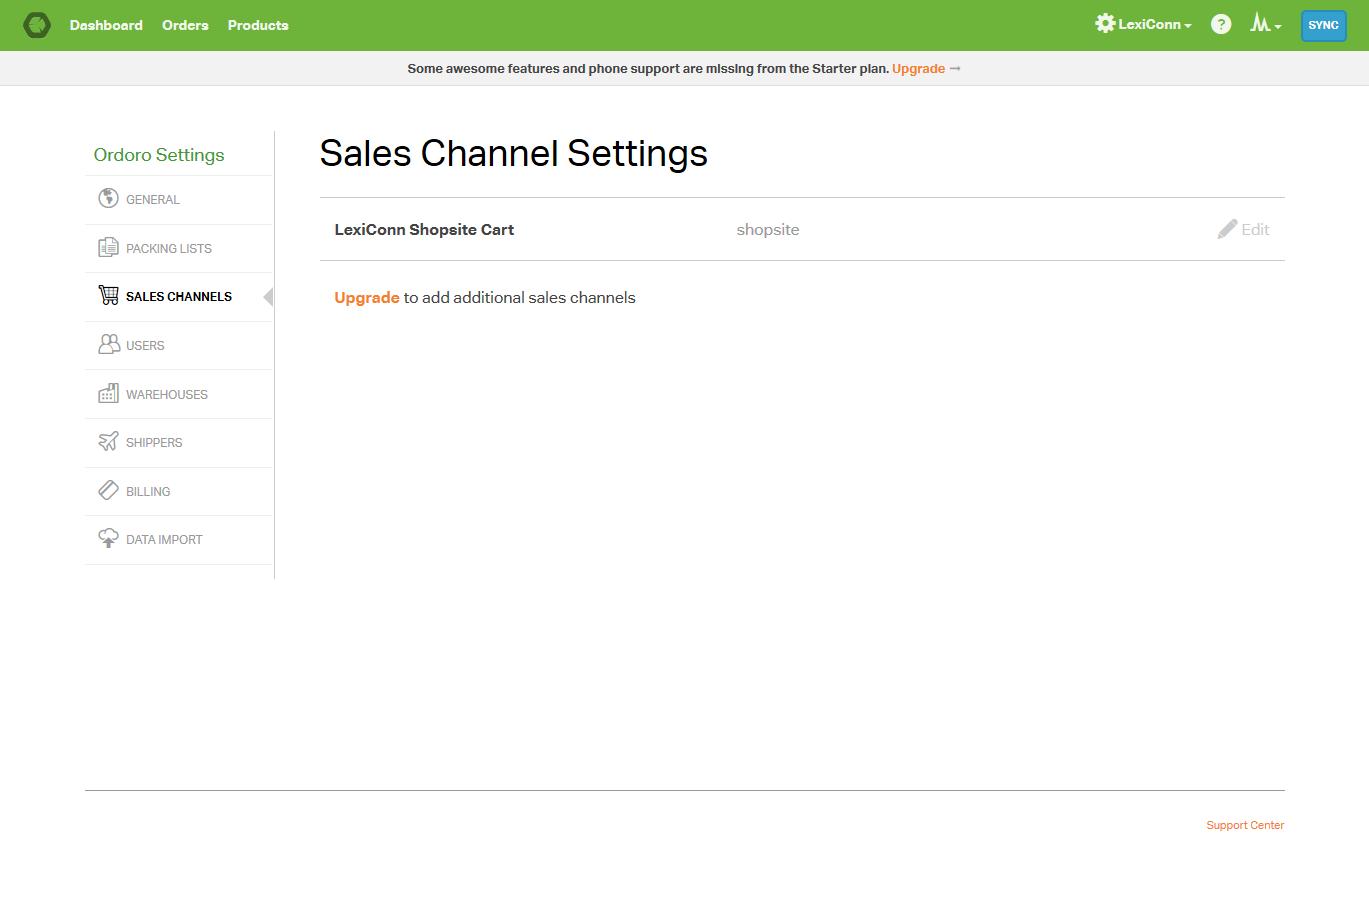 Ordoro - Settings - Sales Channels